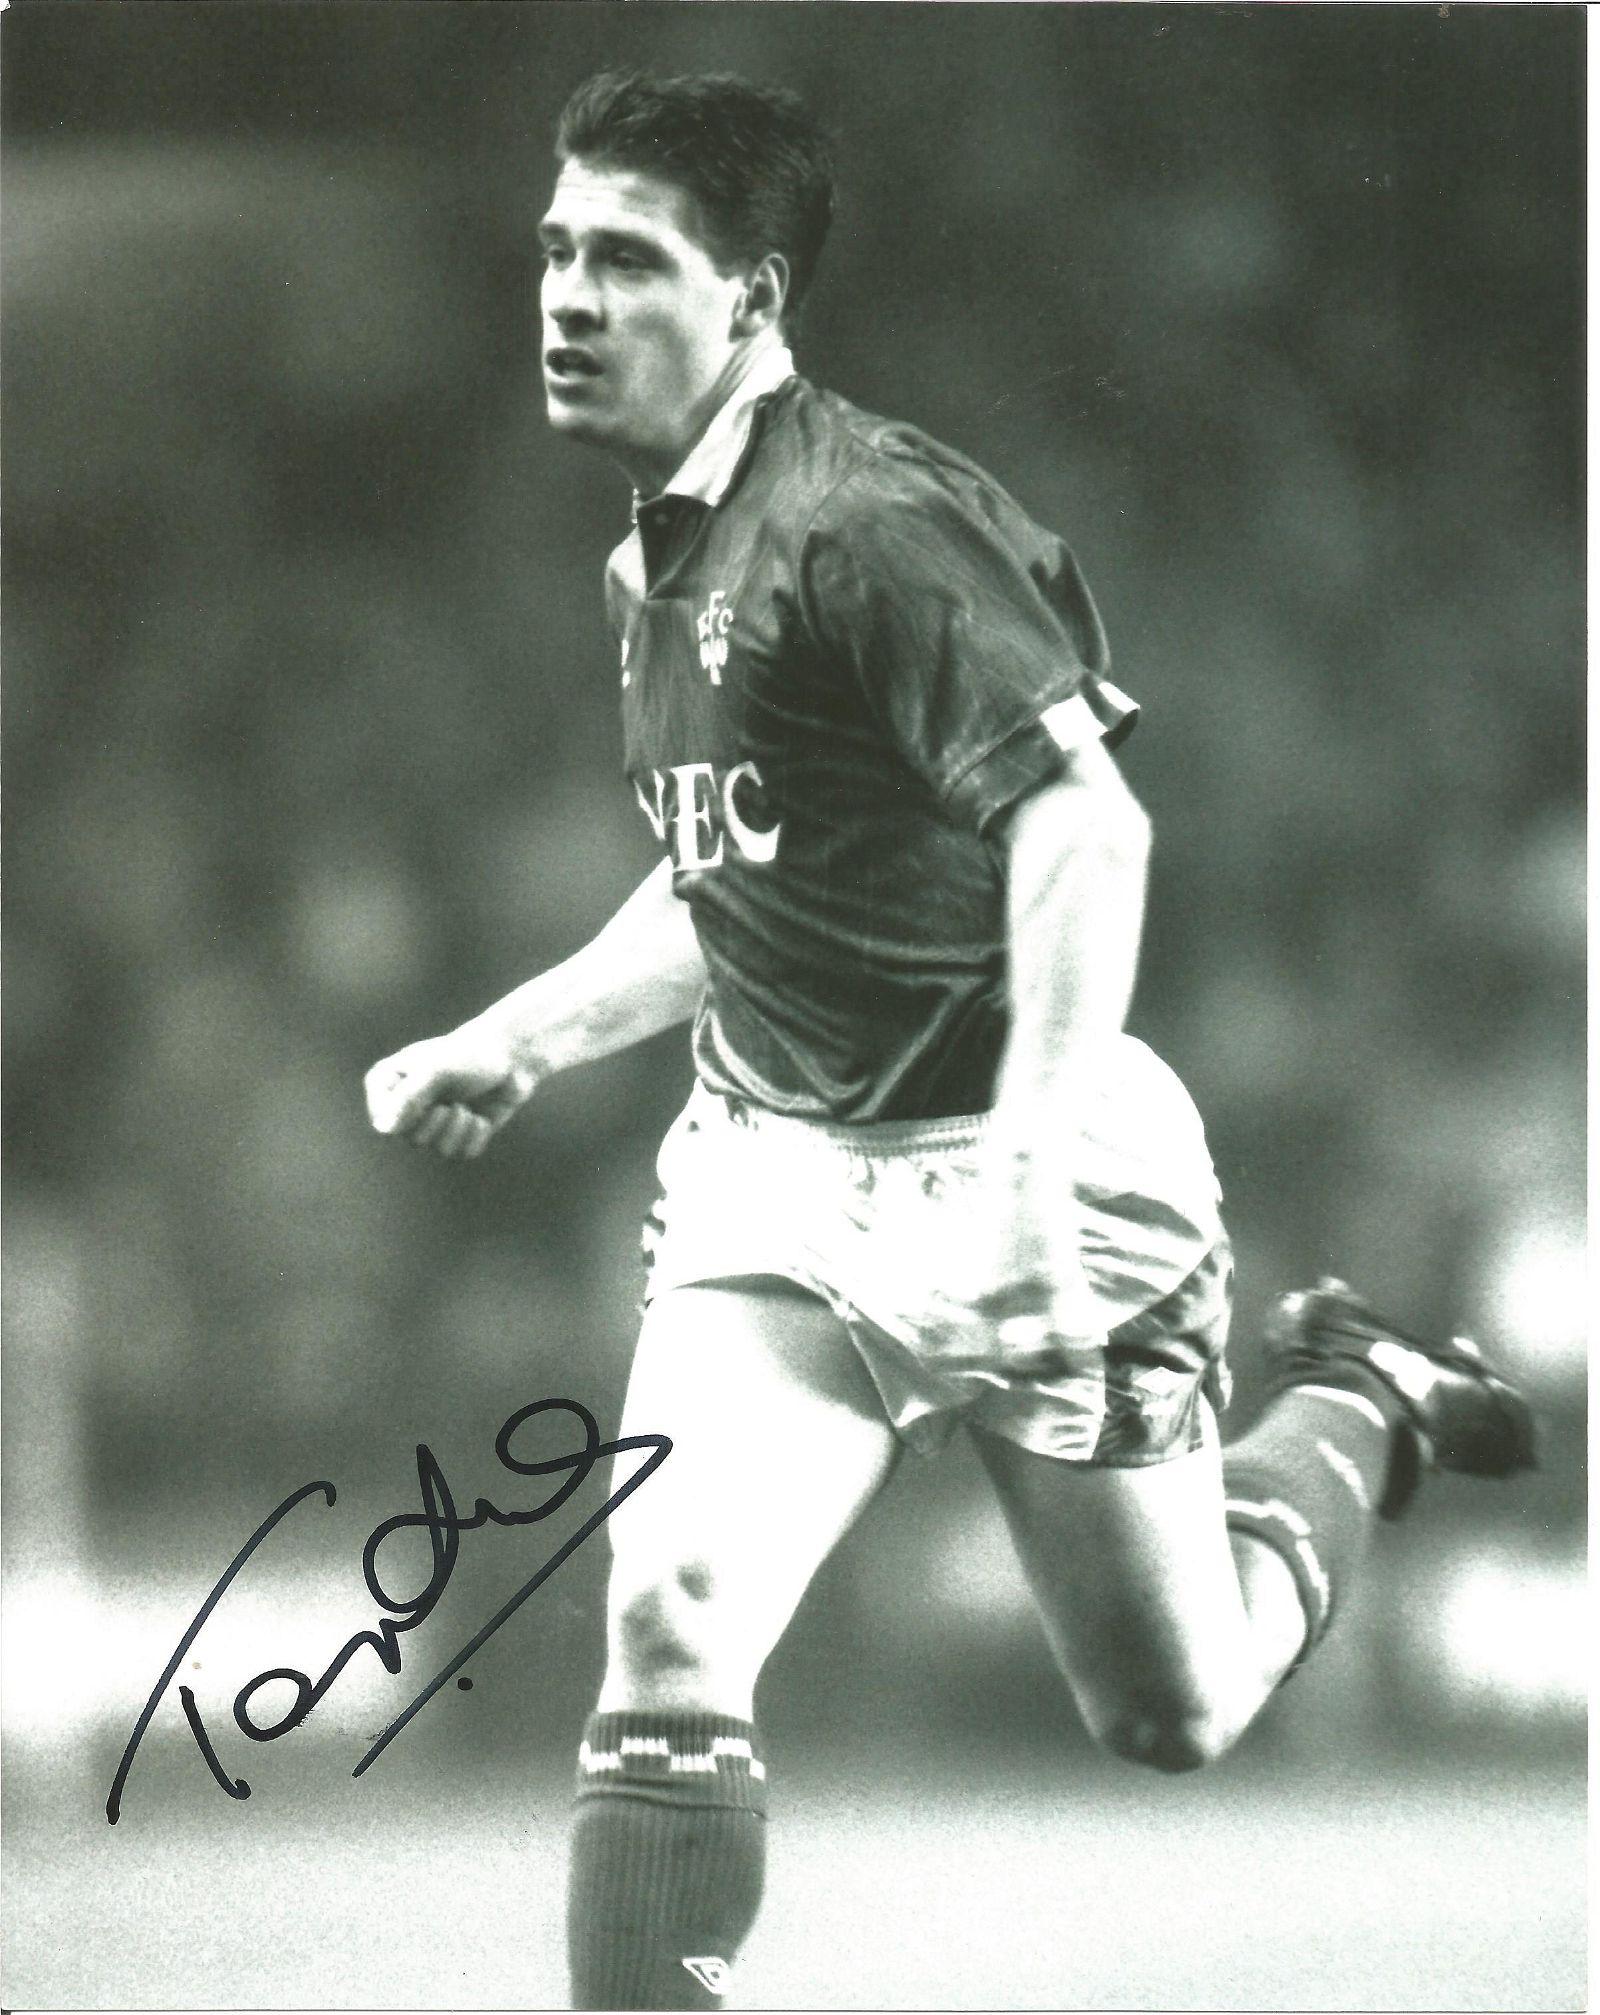 Football Tony Cottee Signed Everton 8x10 Photo. Good